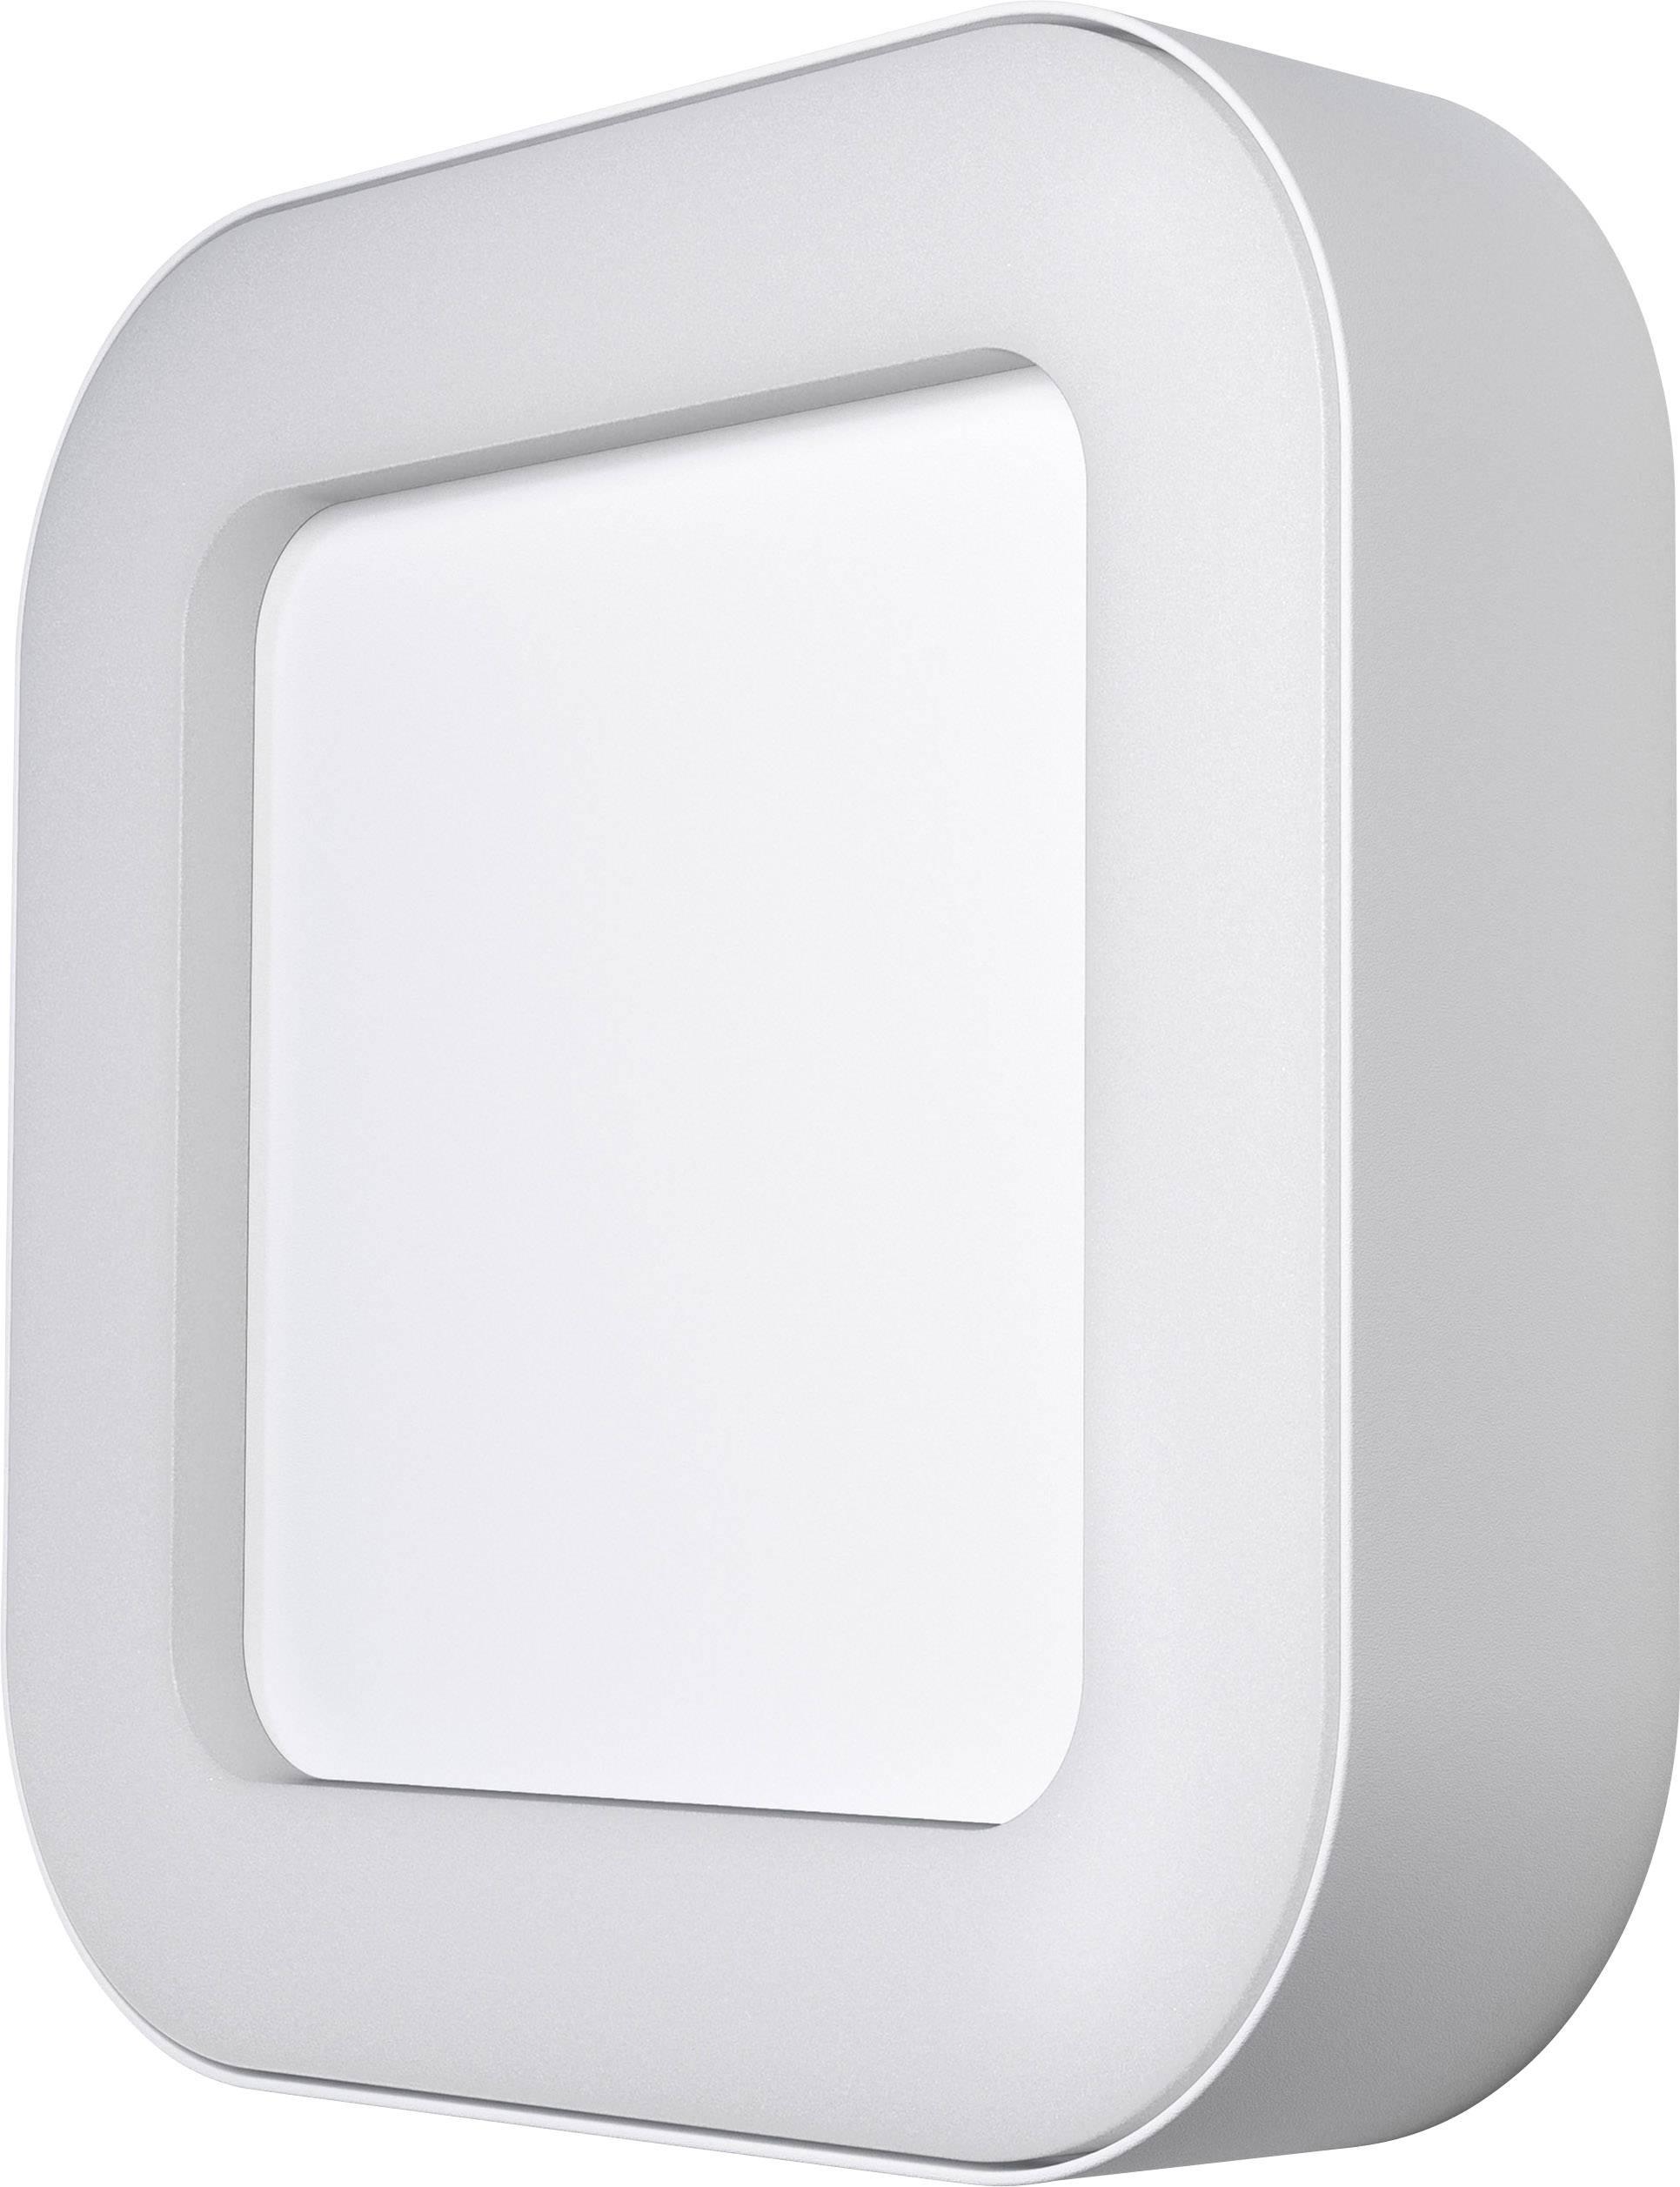 OSRAM Endura® Style Square 4058075031722 Lampada da parete per esterni a LED 13 W Bianco caldo Bianco